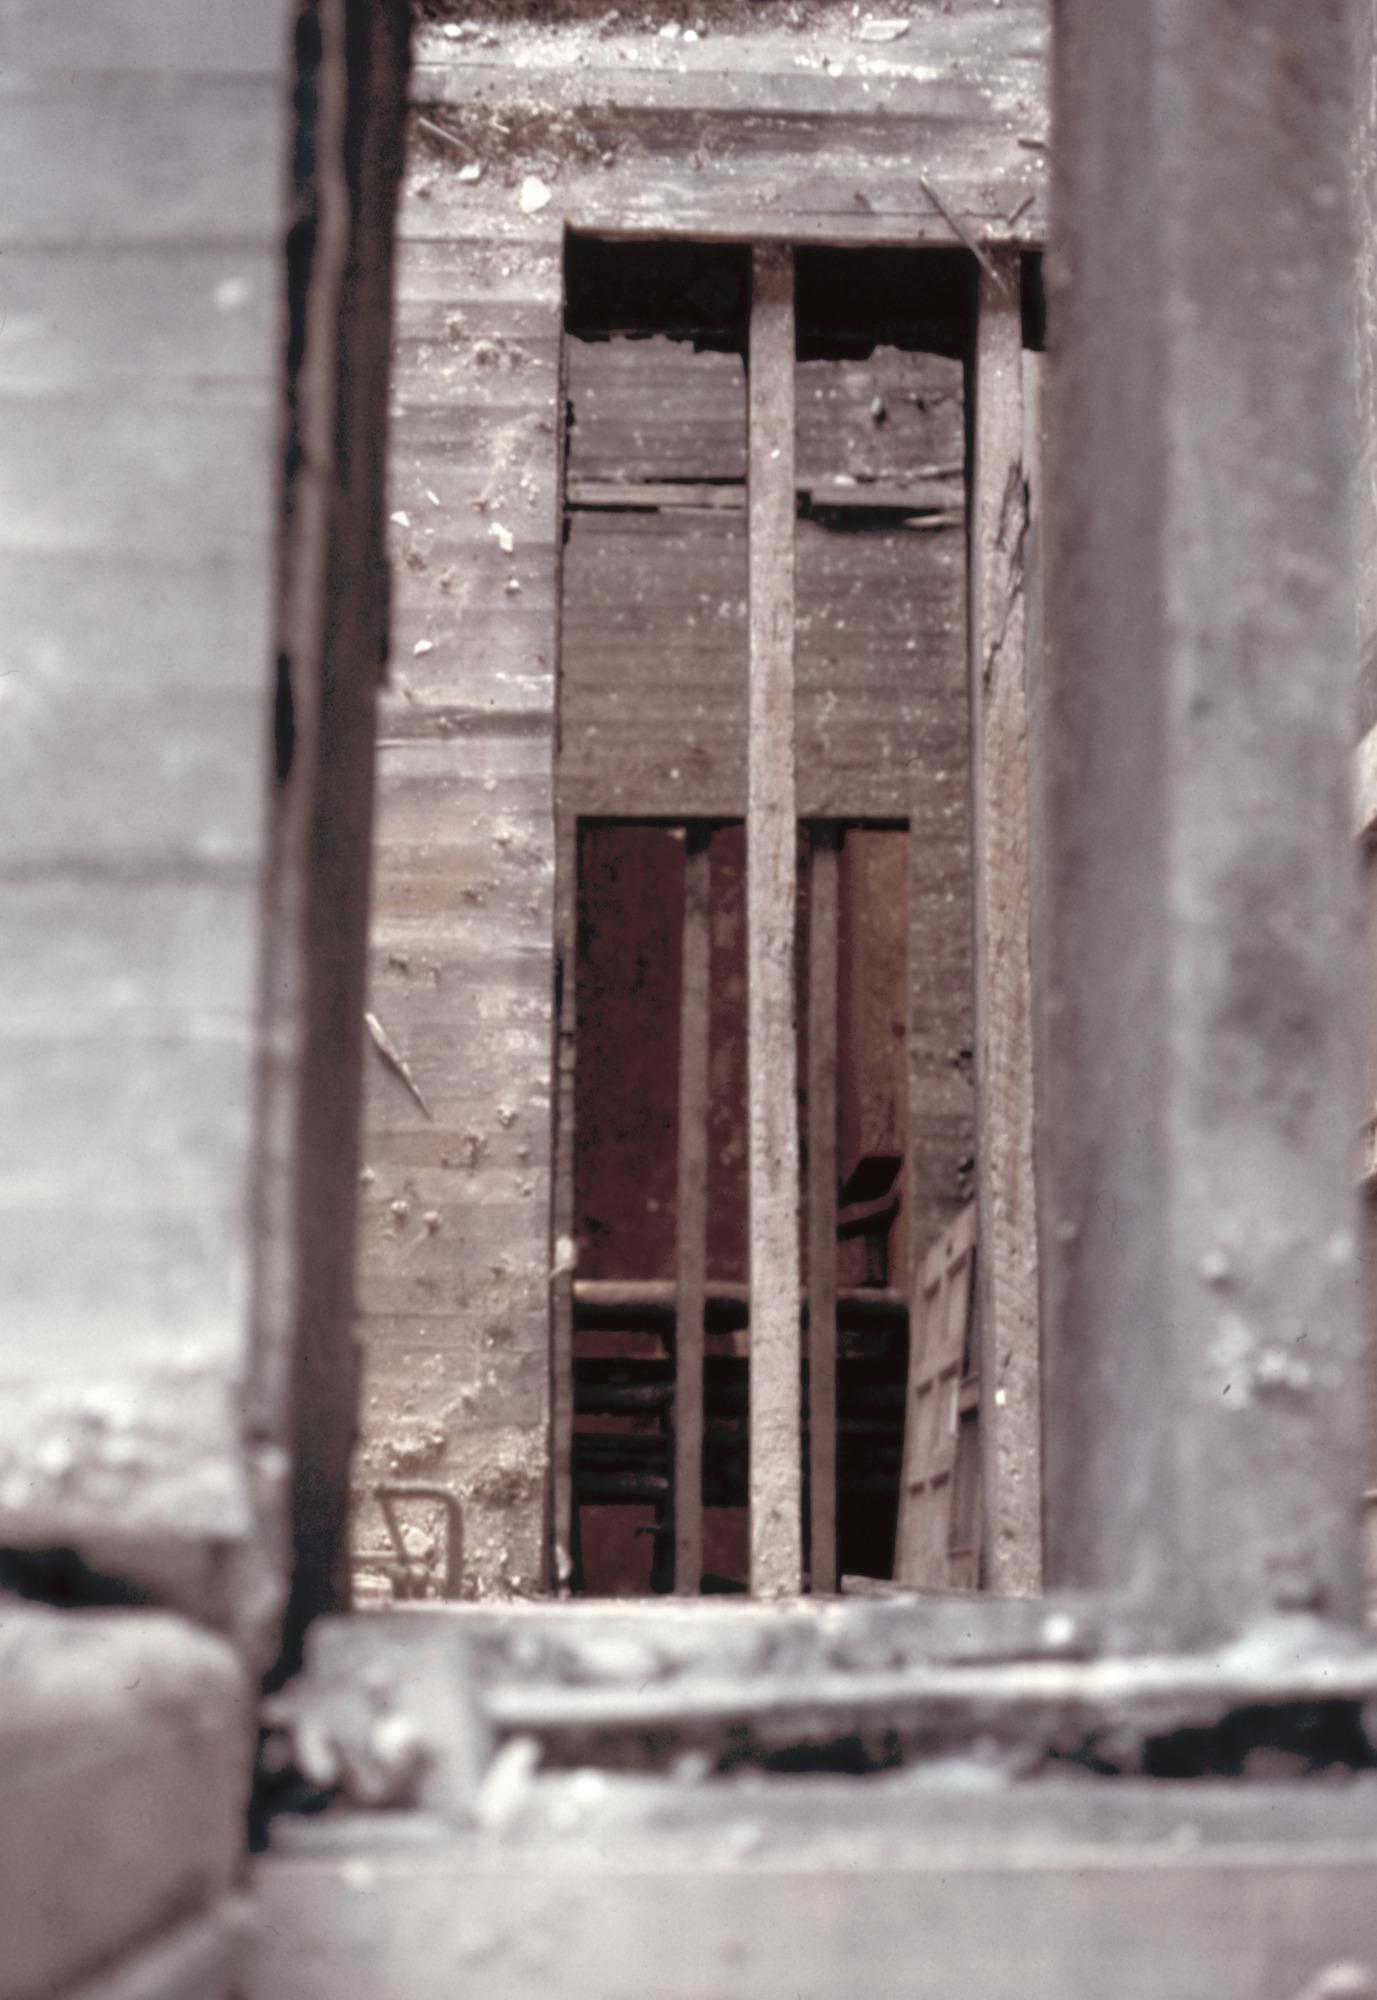 1976 - PS1 Rooms - 09 (Matta Clark).jpg